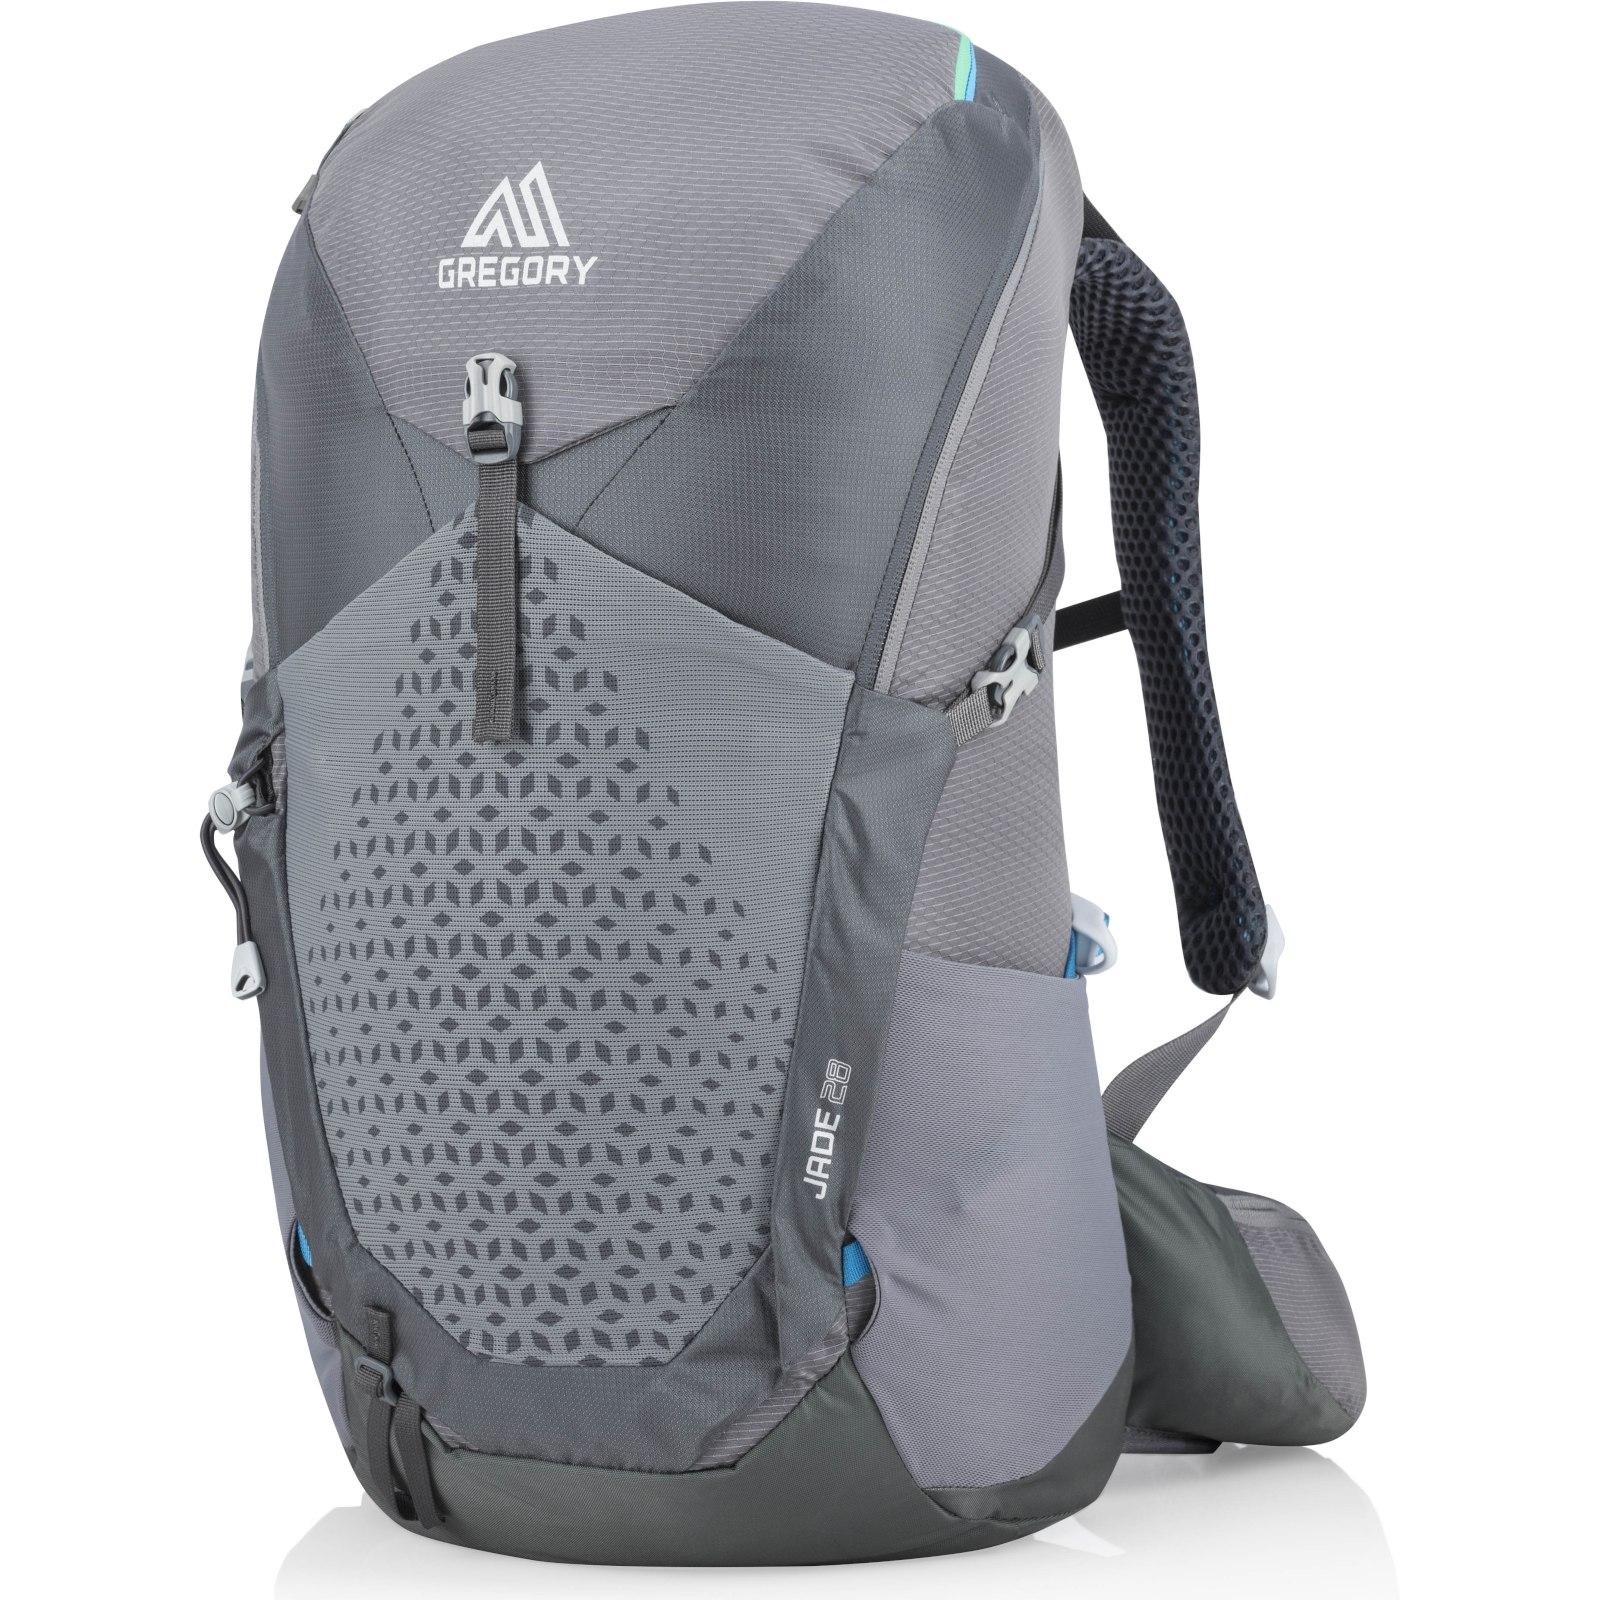 Gregory Jade 28 Women's Backpack - Ethereal Grey